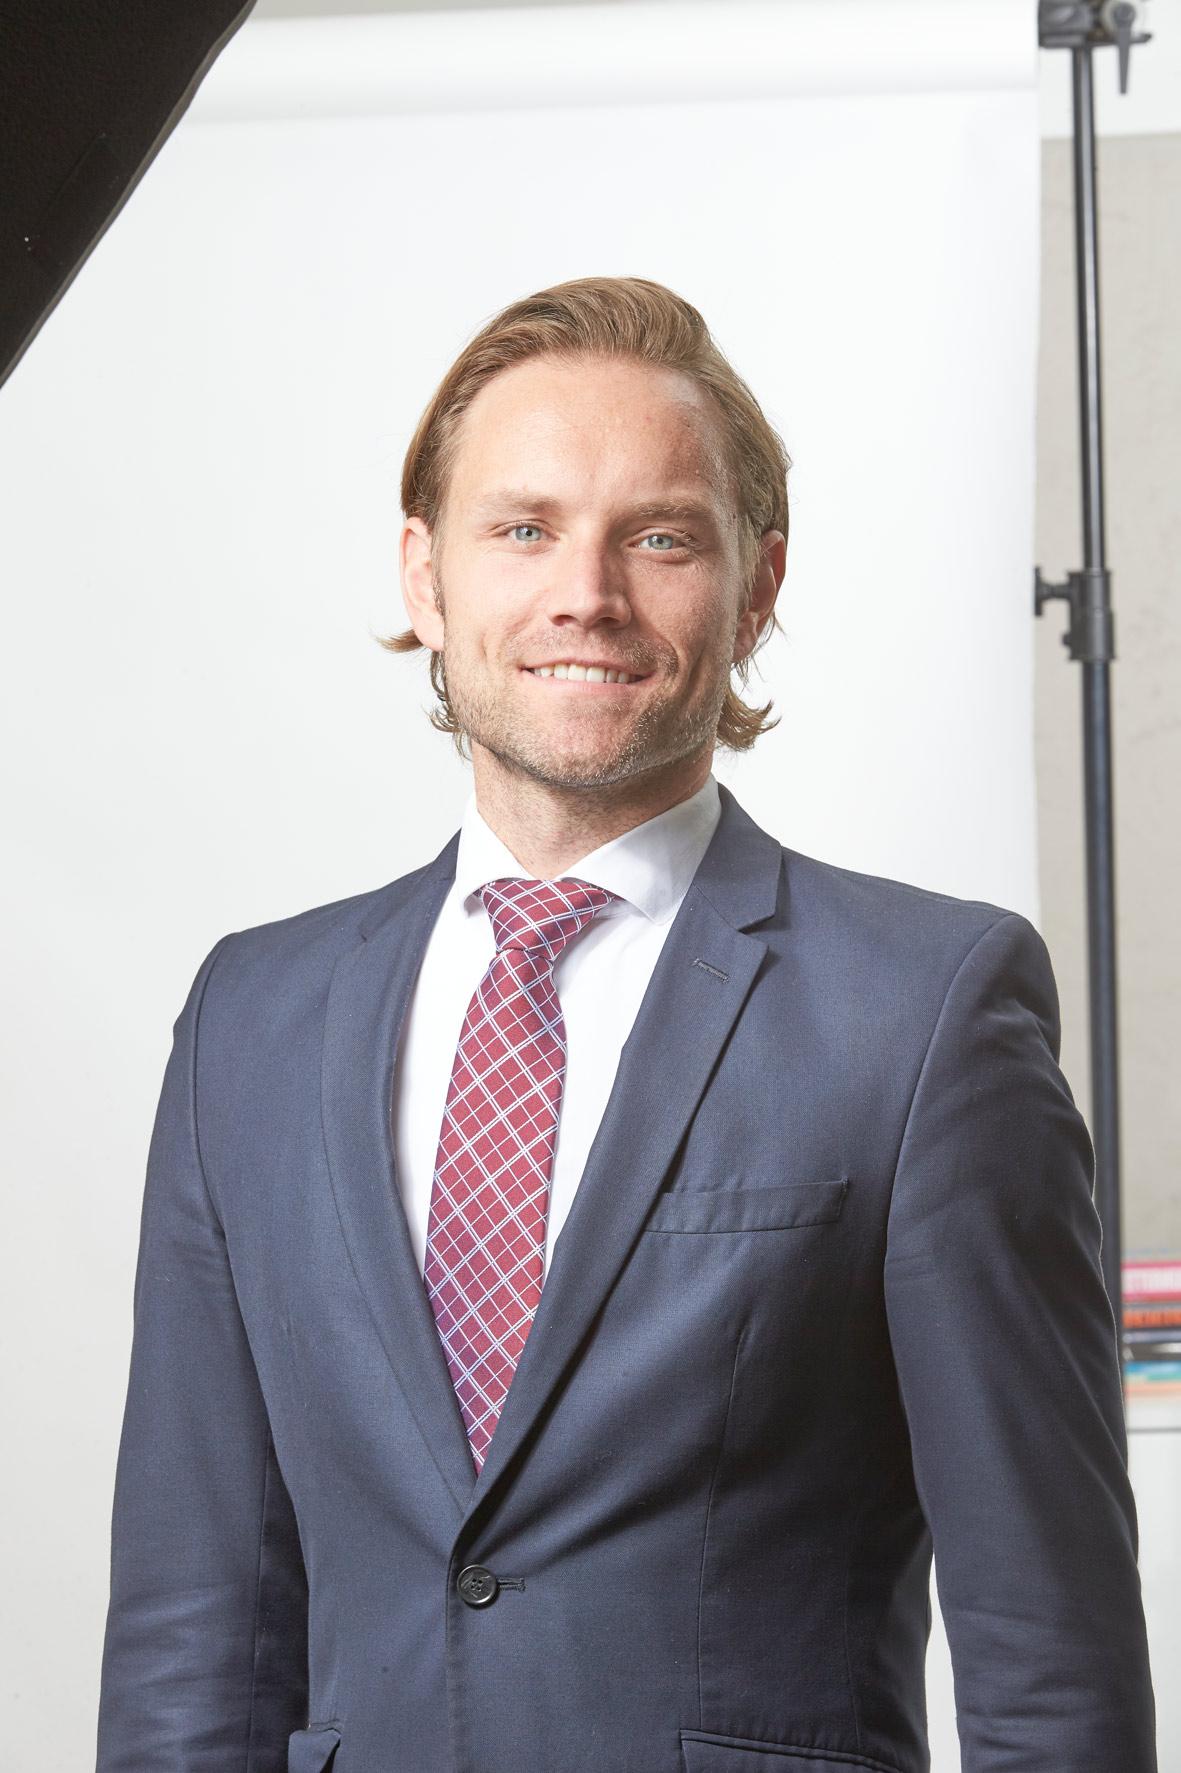 Nils Hölschermann